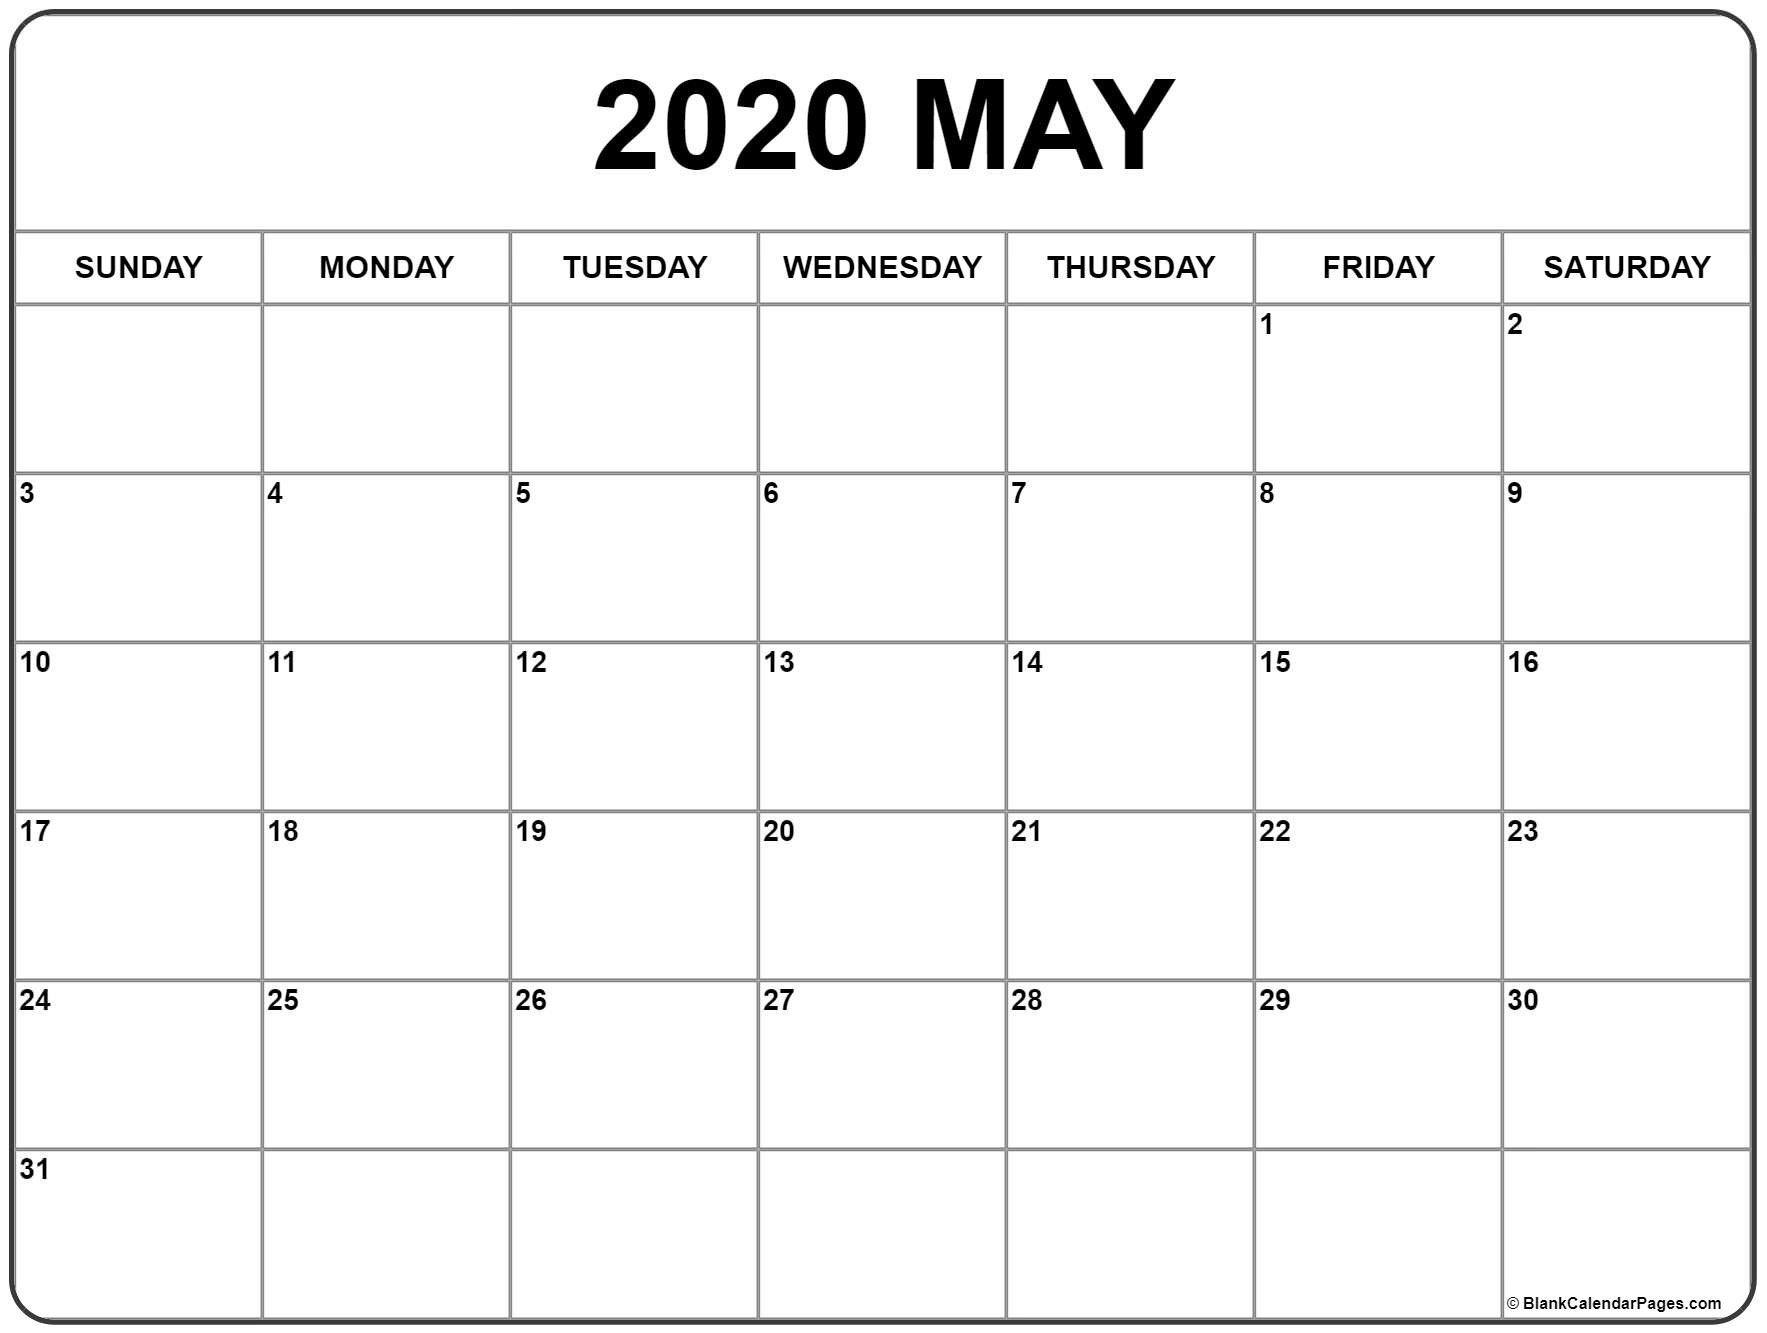 Blank May 2020 Calendar Printable Beta Calendars May 2020 intended for November 2020 Calendar Beta Calendars